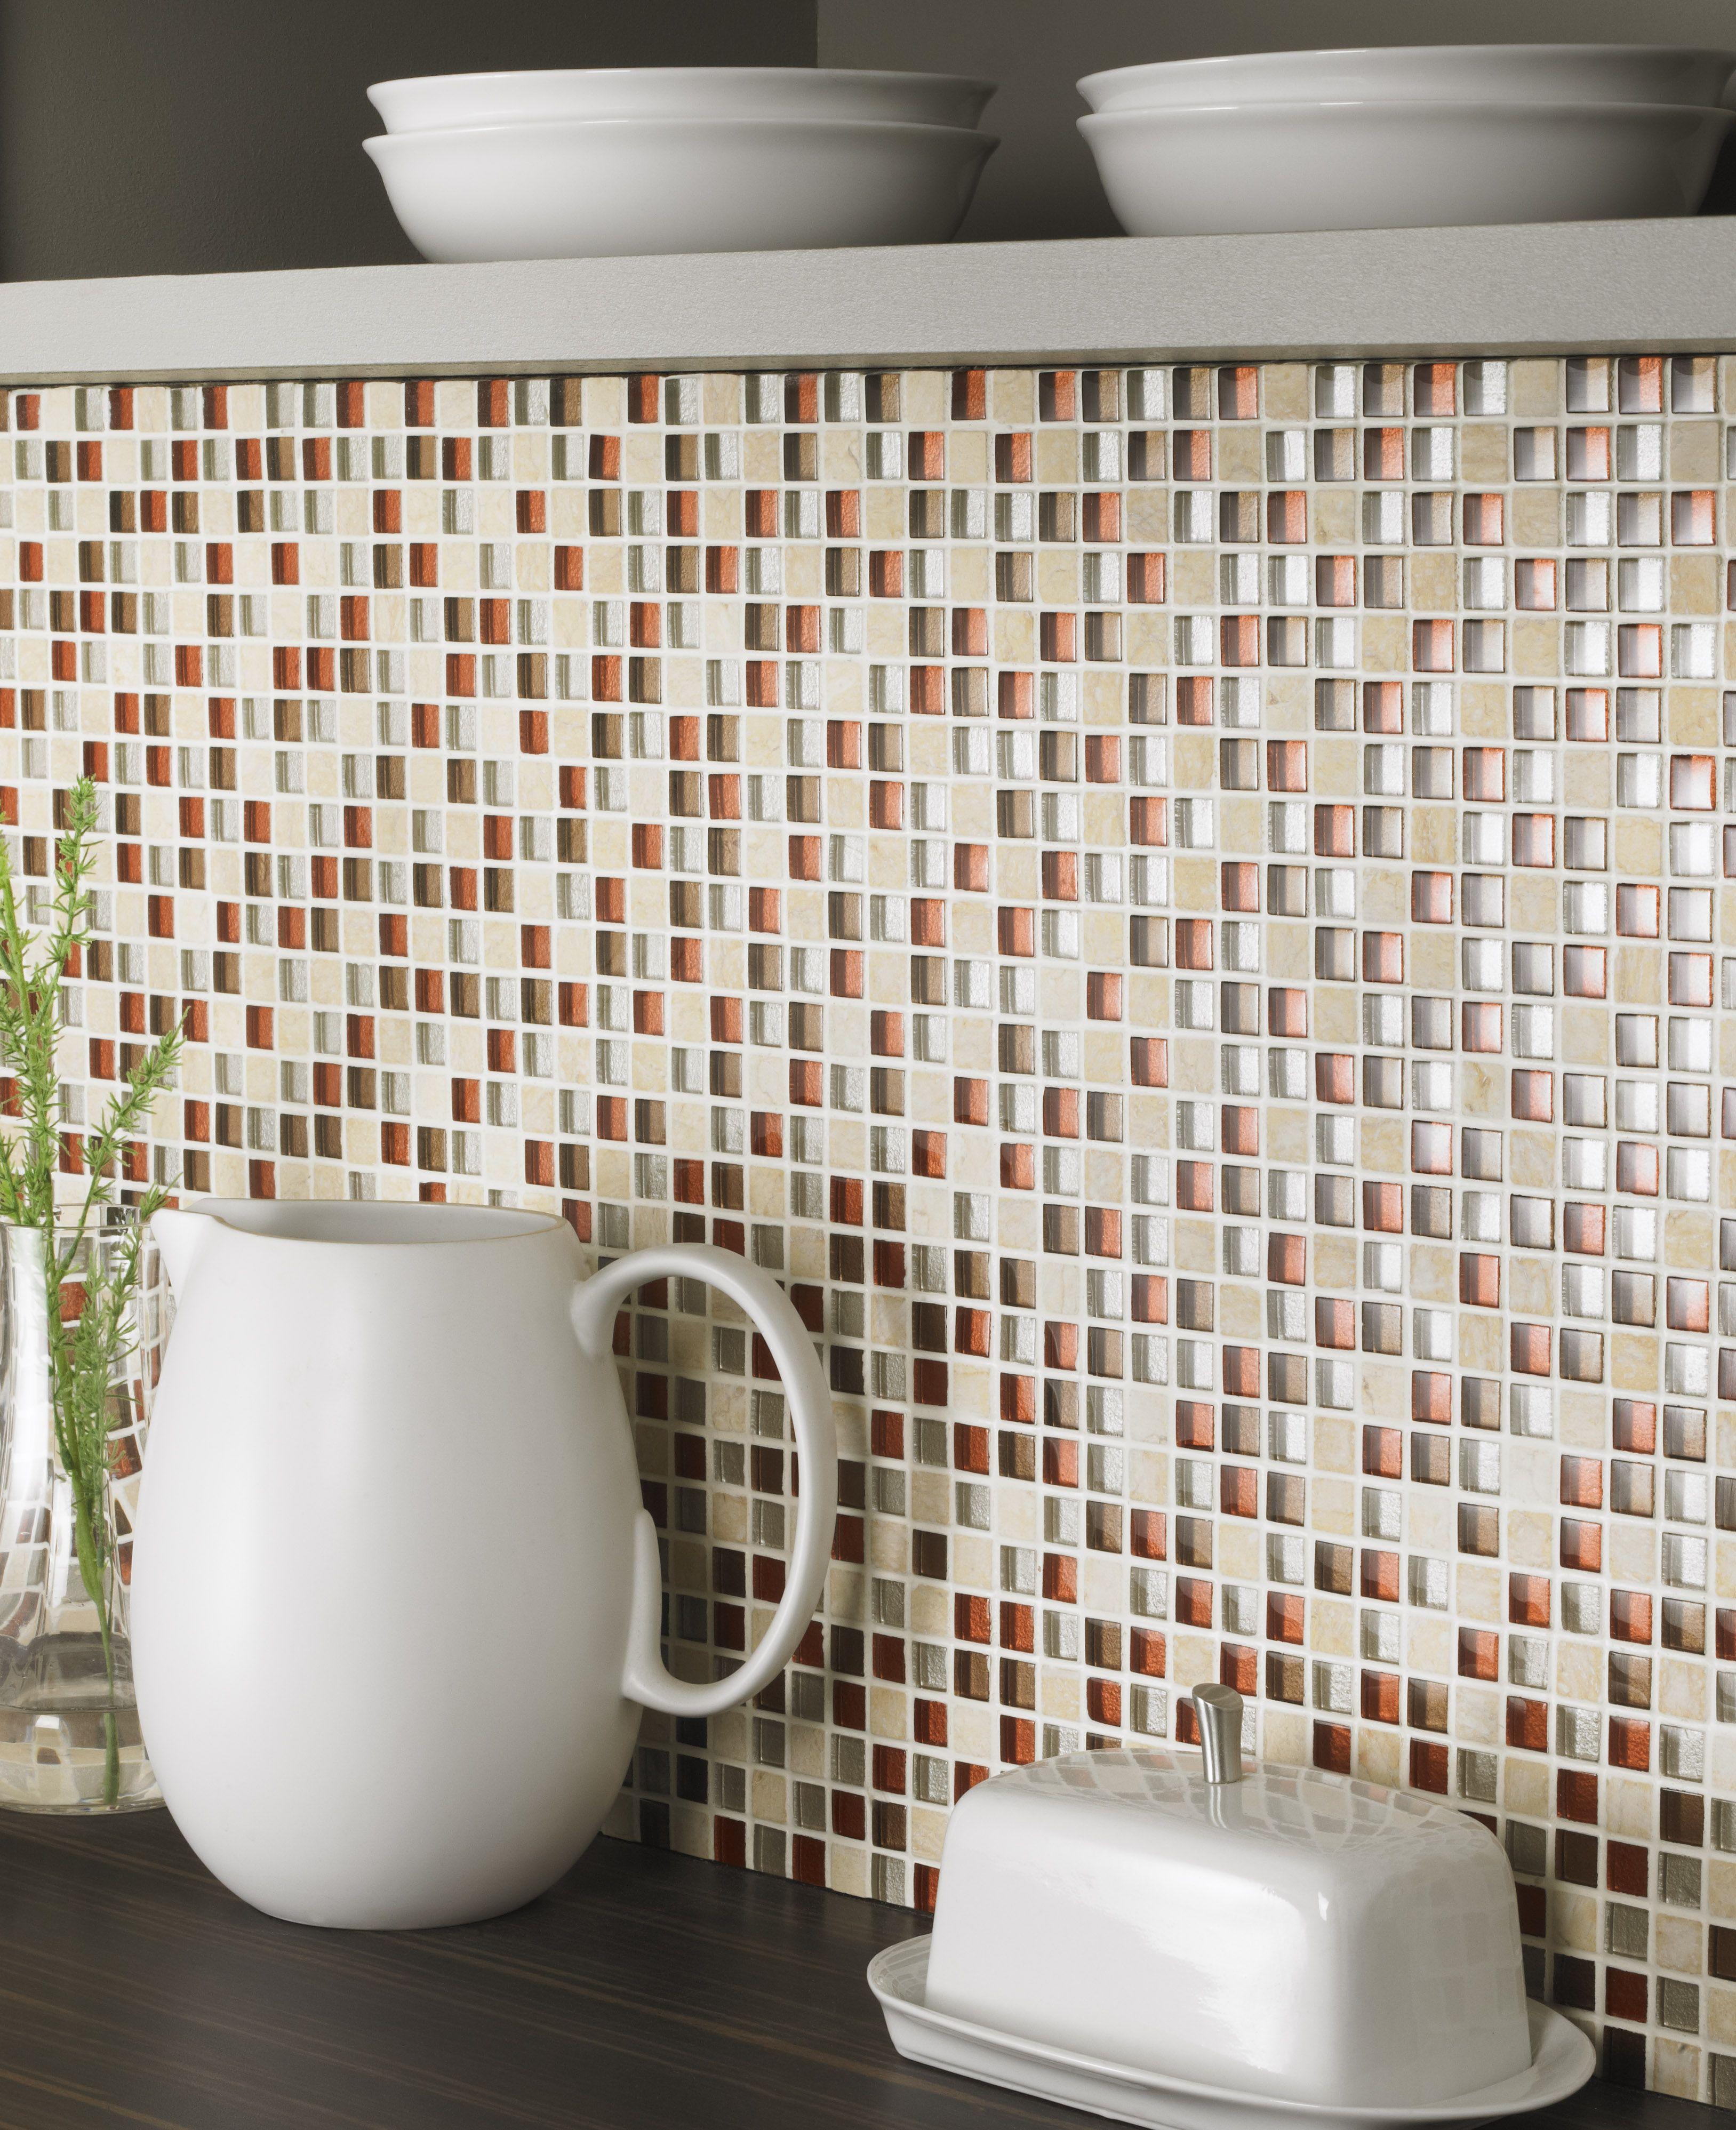 Mosaics stone autumn mix mosaic tile from house of british ceramic mosaics stone autumn mix mosaic tile from house of british ceramic tile from house of ceramic dailygadgetfo Choice Image